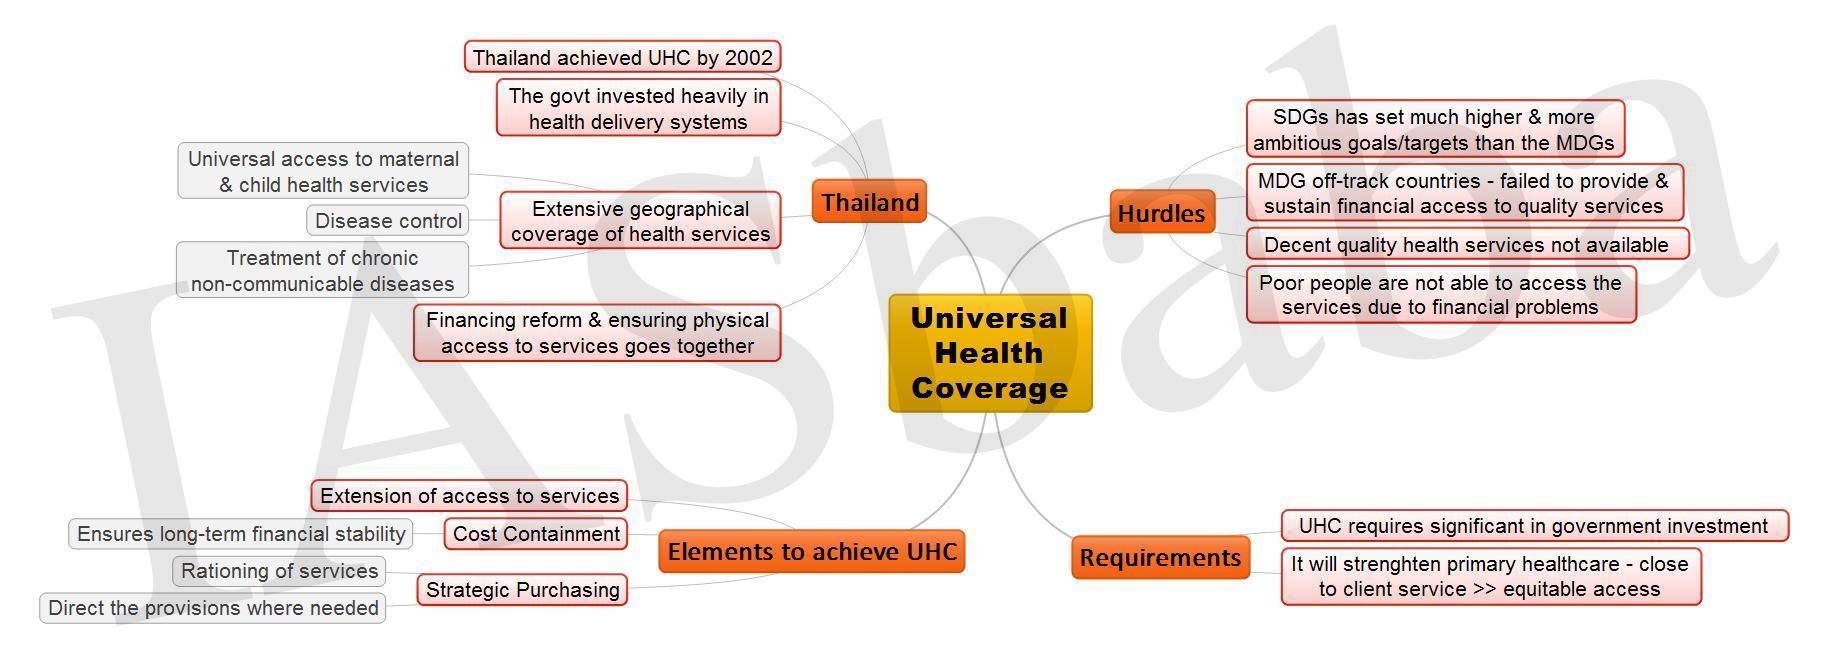 Universal Health Coverage JPEG